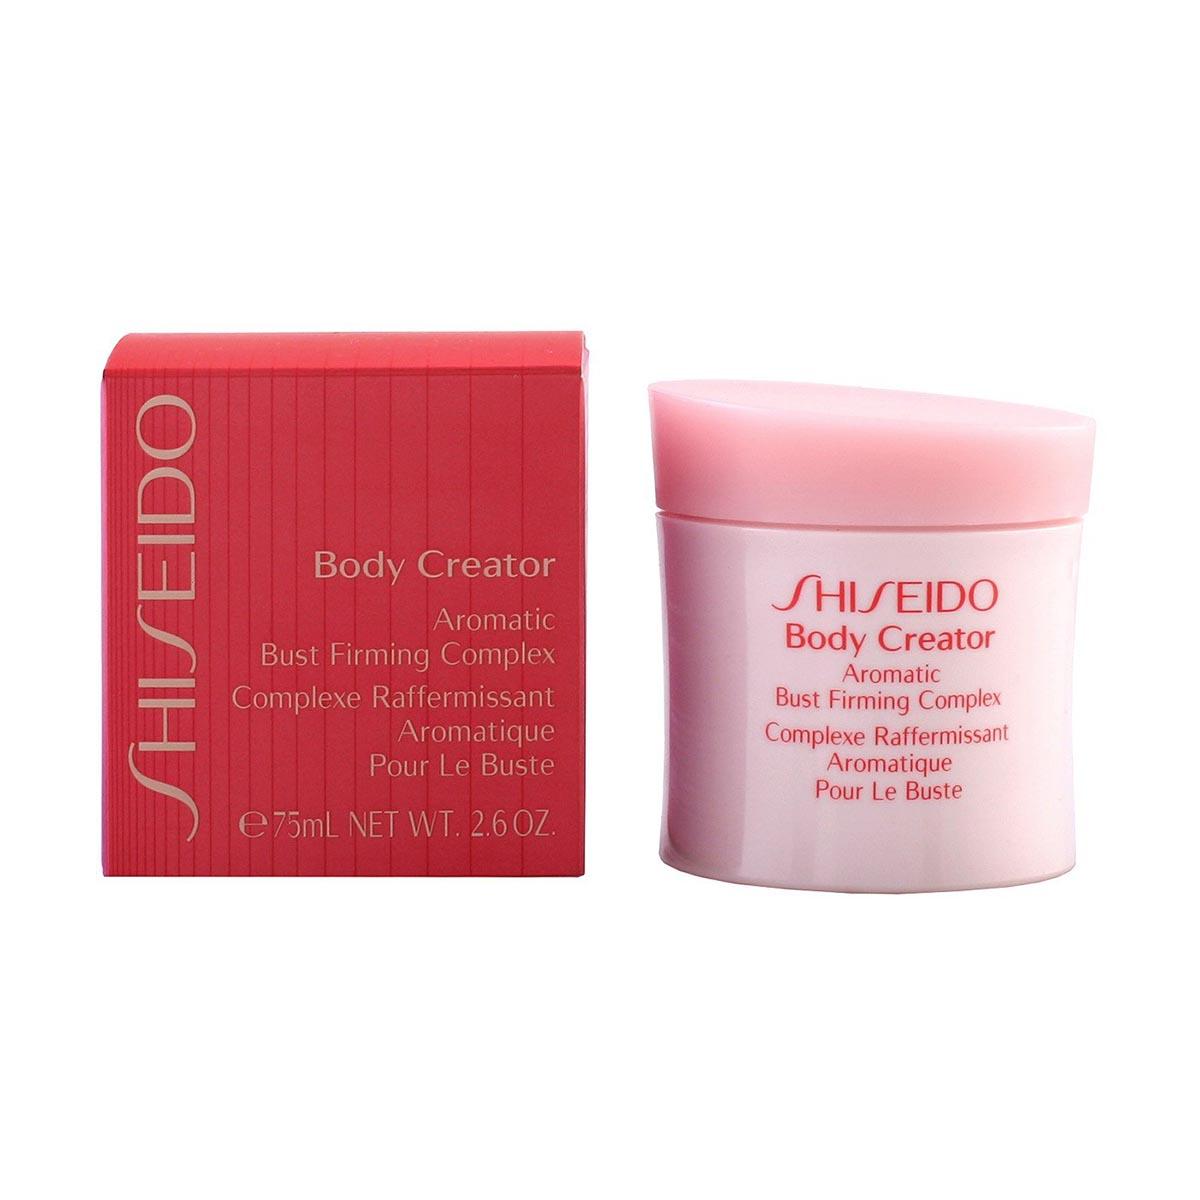 Shiseido body creator aromatic bust firming complex 75ml